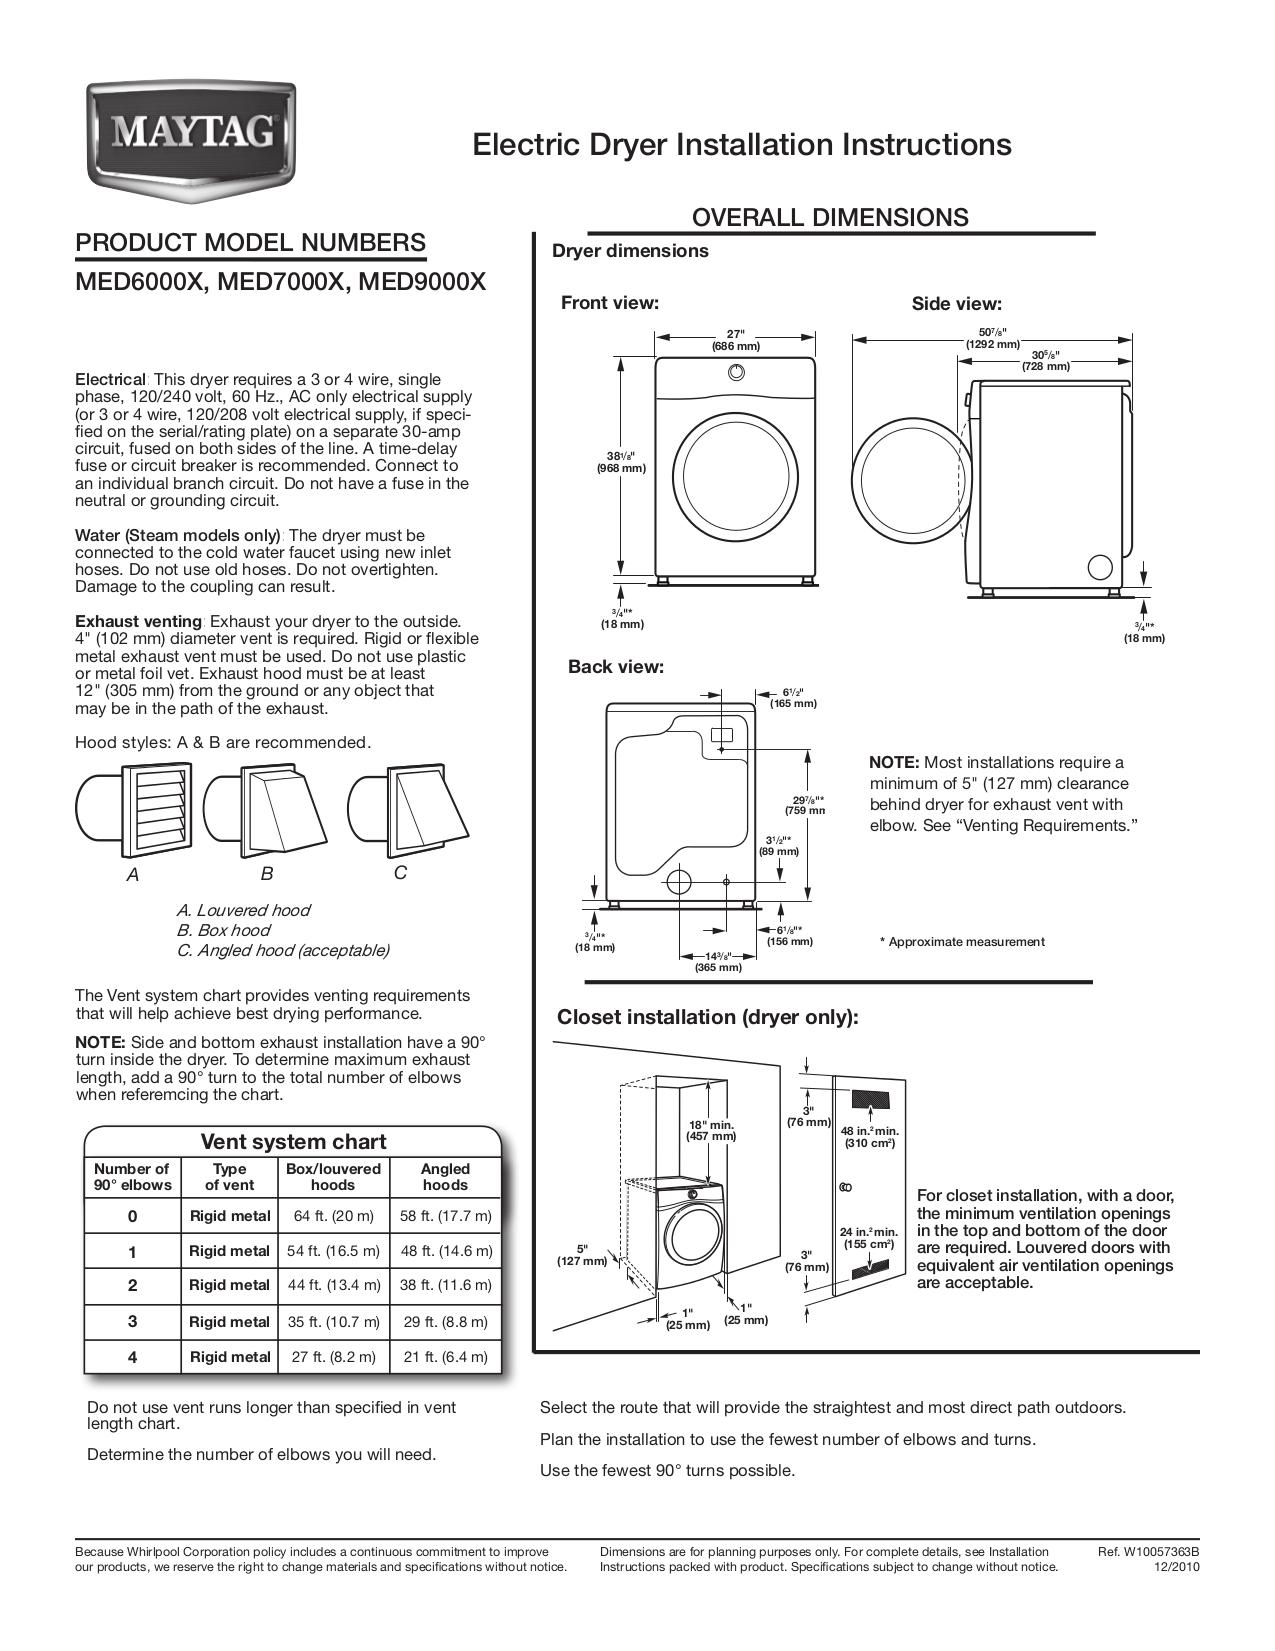 download free pdf for maytag med6000x dryer manual rh umlib com Maytag Dryer Troubleshooting Maytag Dryer Troubleshooting